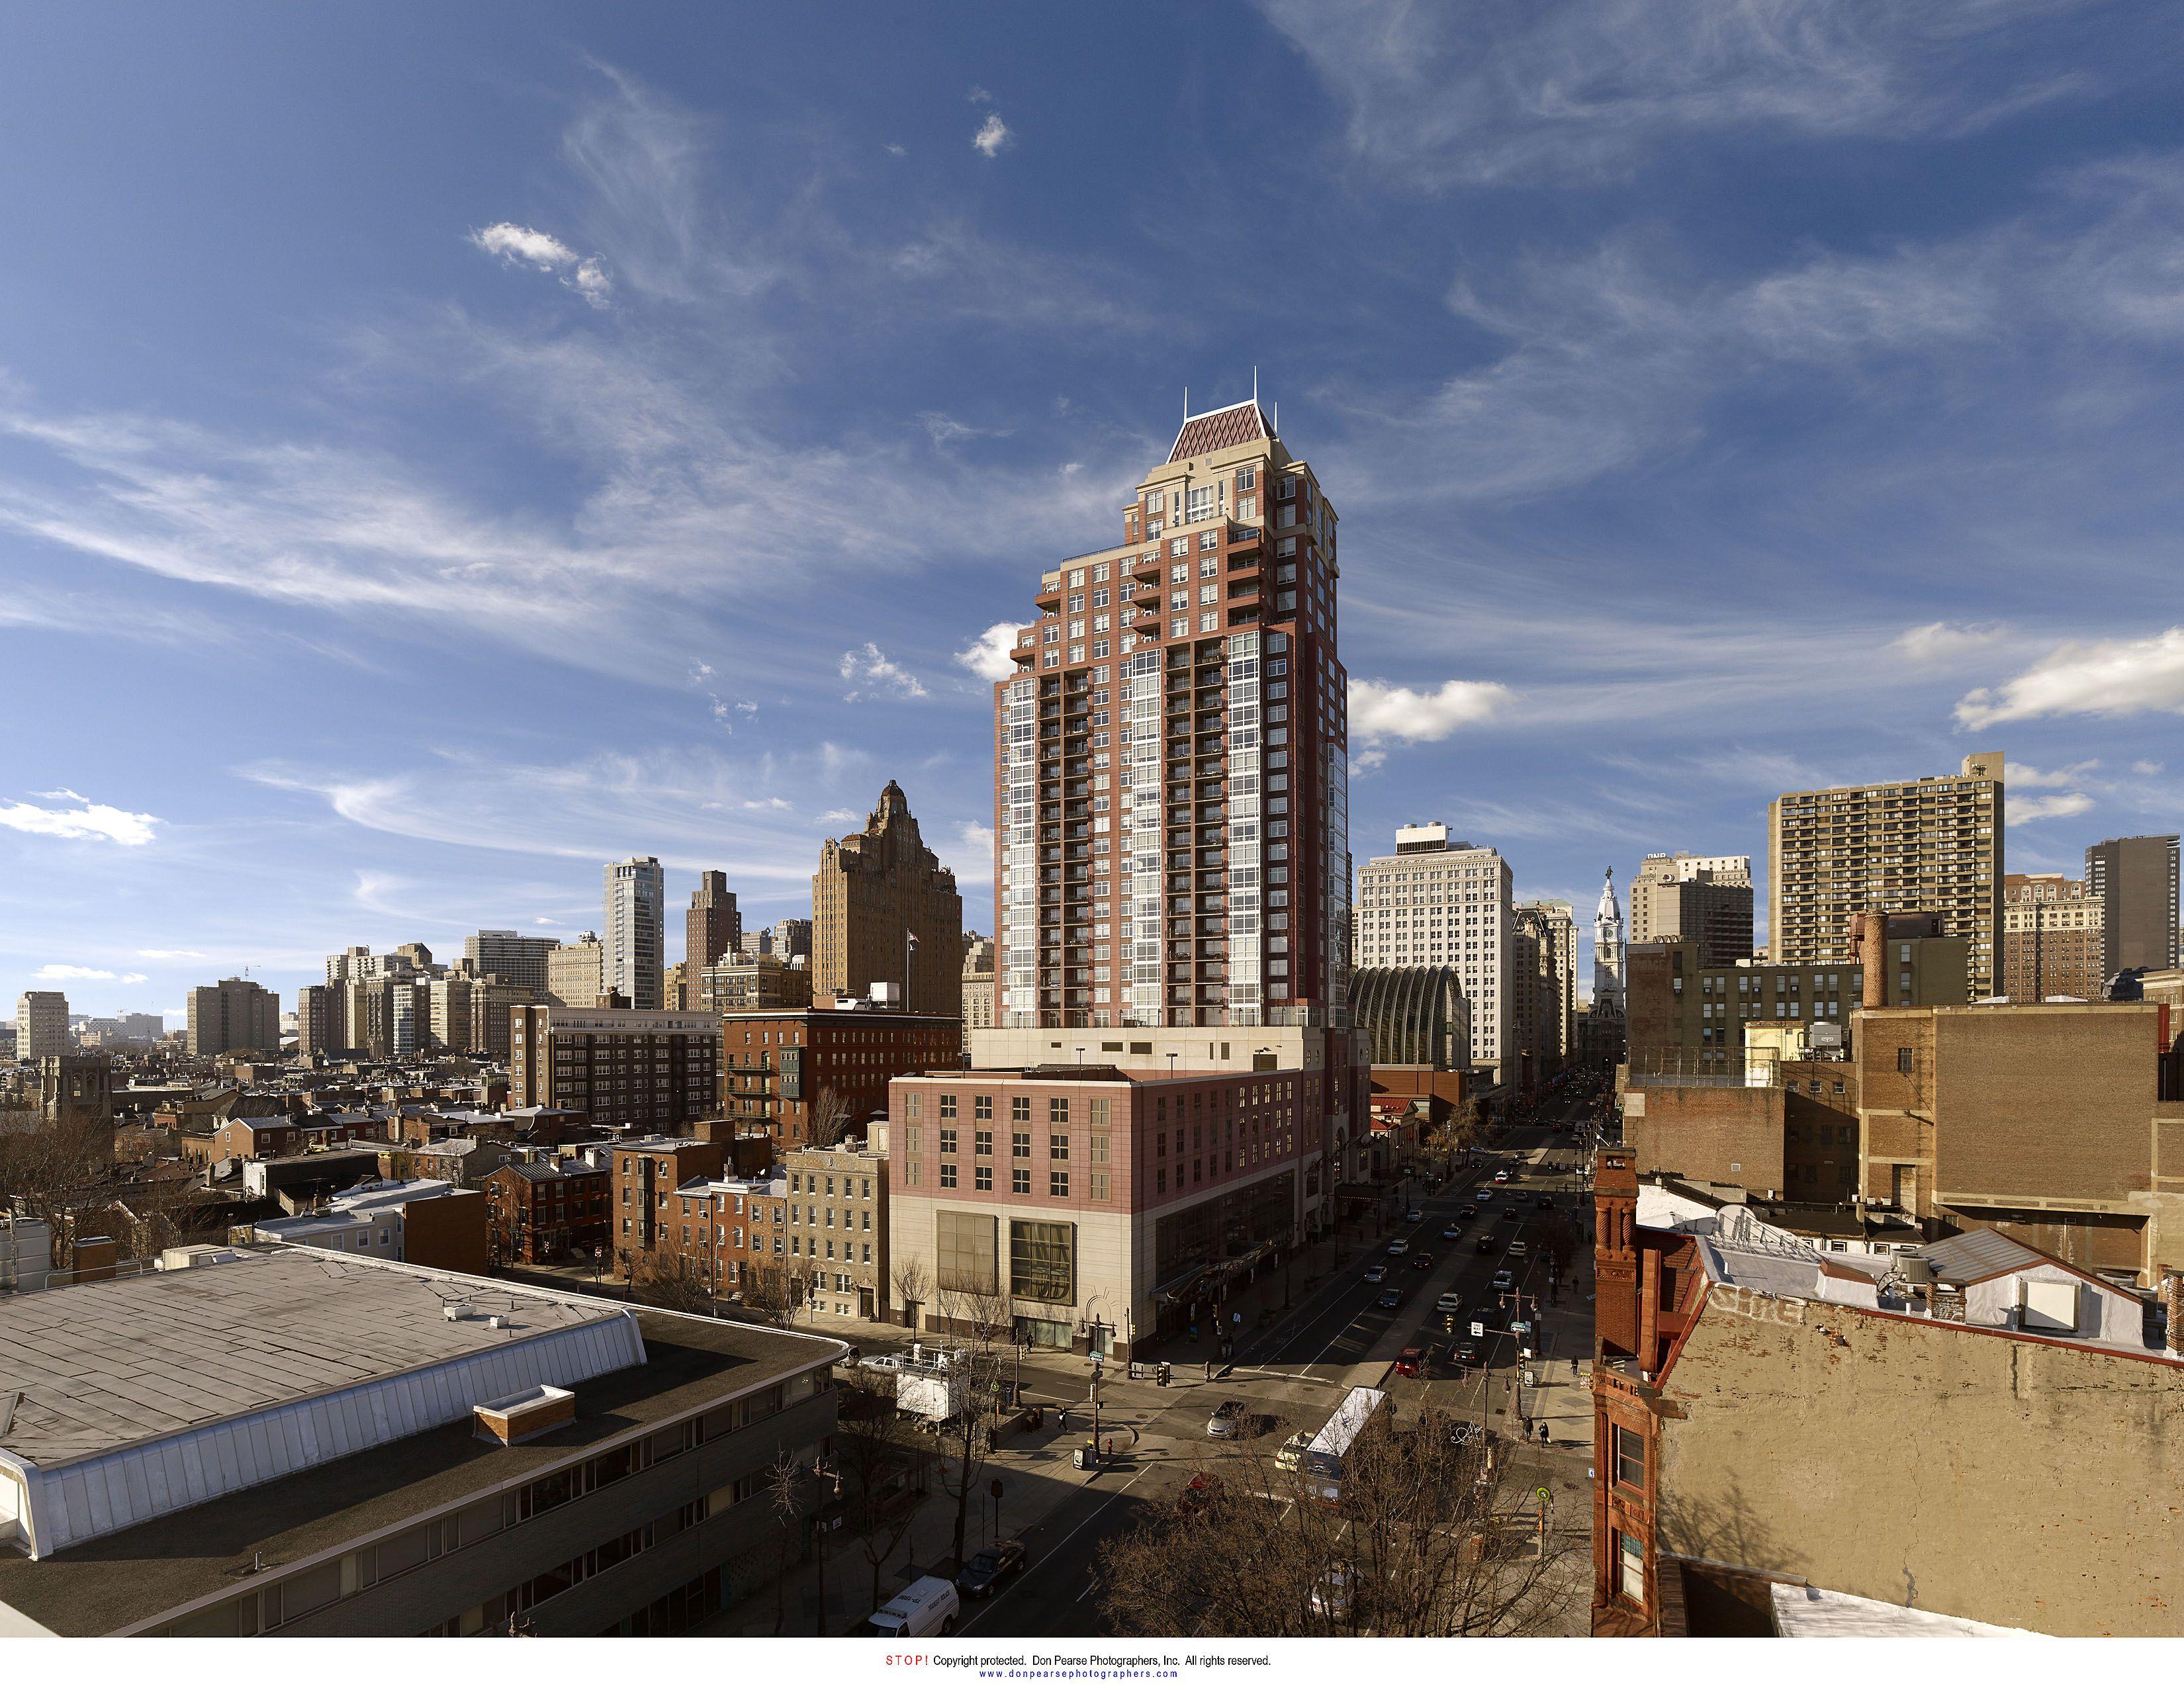 Philadelphia Apartments Starting at 1,595! Website www